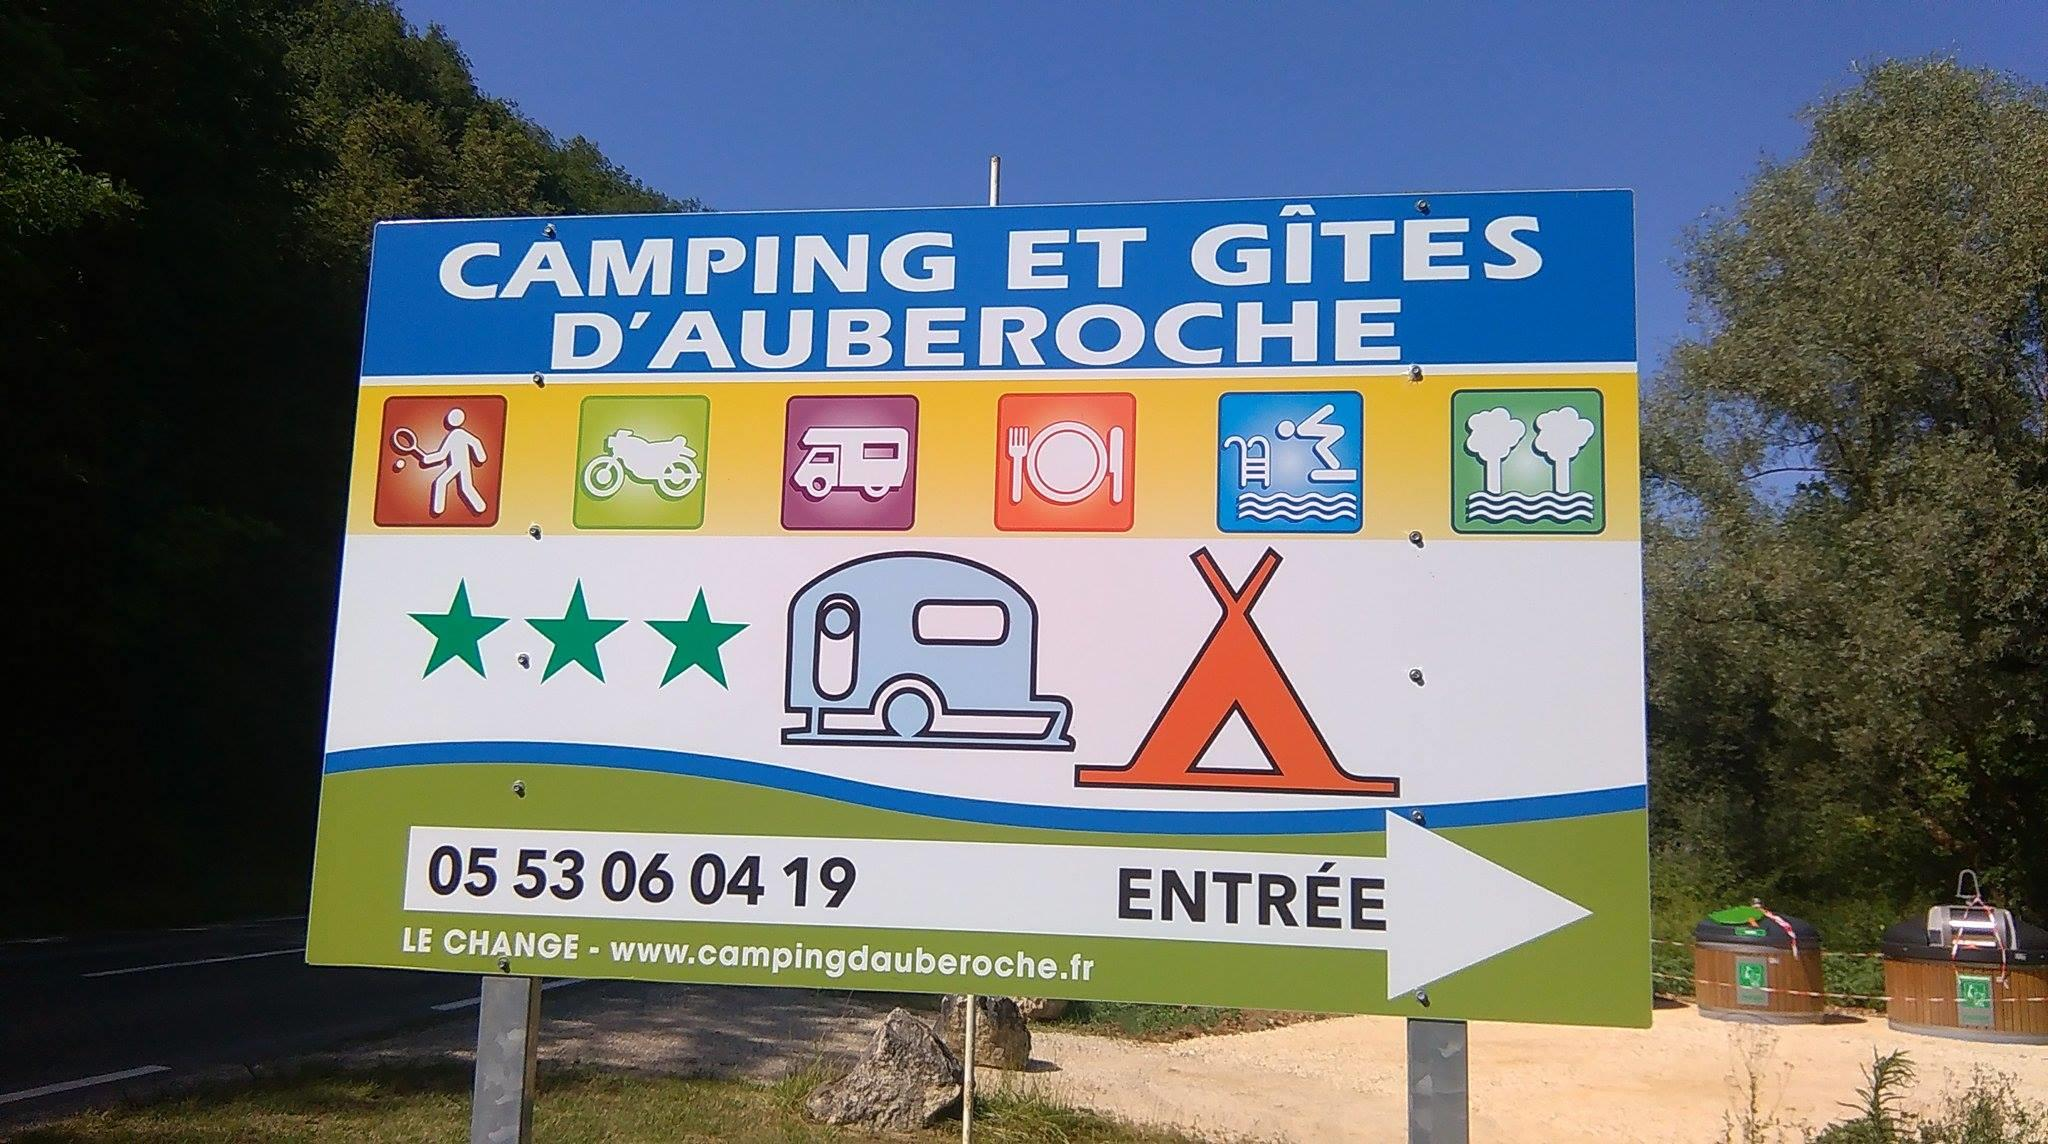 Camping d'Auberoche, Le Change, Dordogne